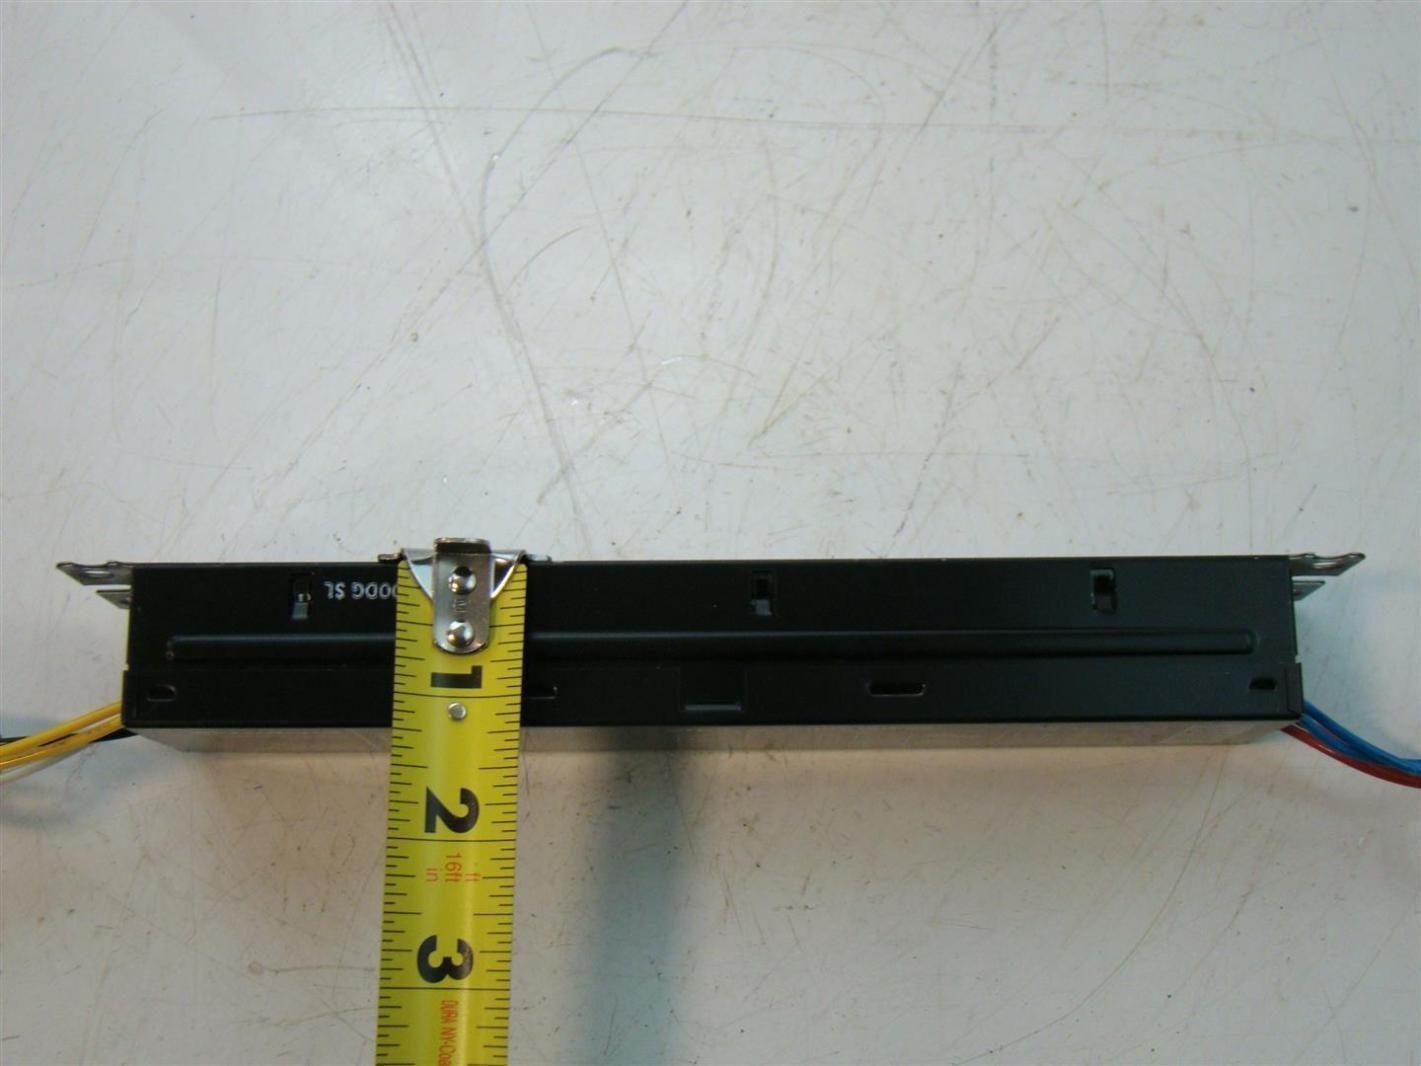 Plusrite Ballast Wiring Manual Guide Diagram 100 Watt Metal Halide Triad C2642unvbes Cf Electronic Odicis Light Bulb